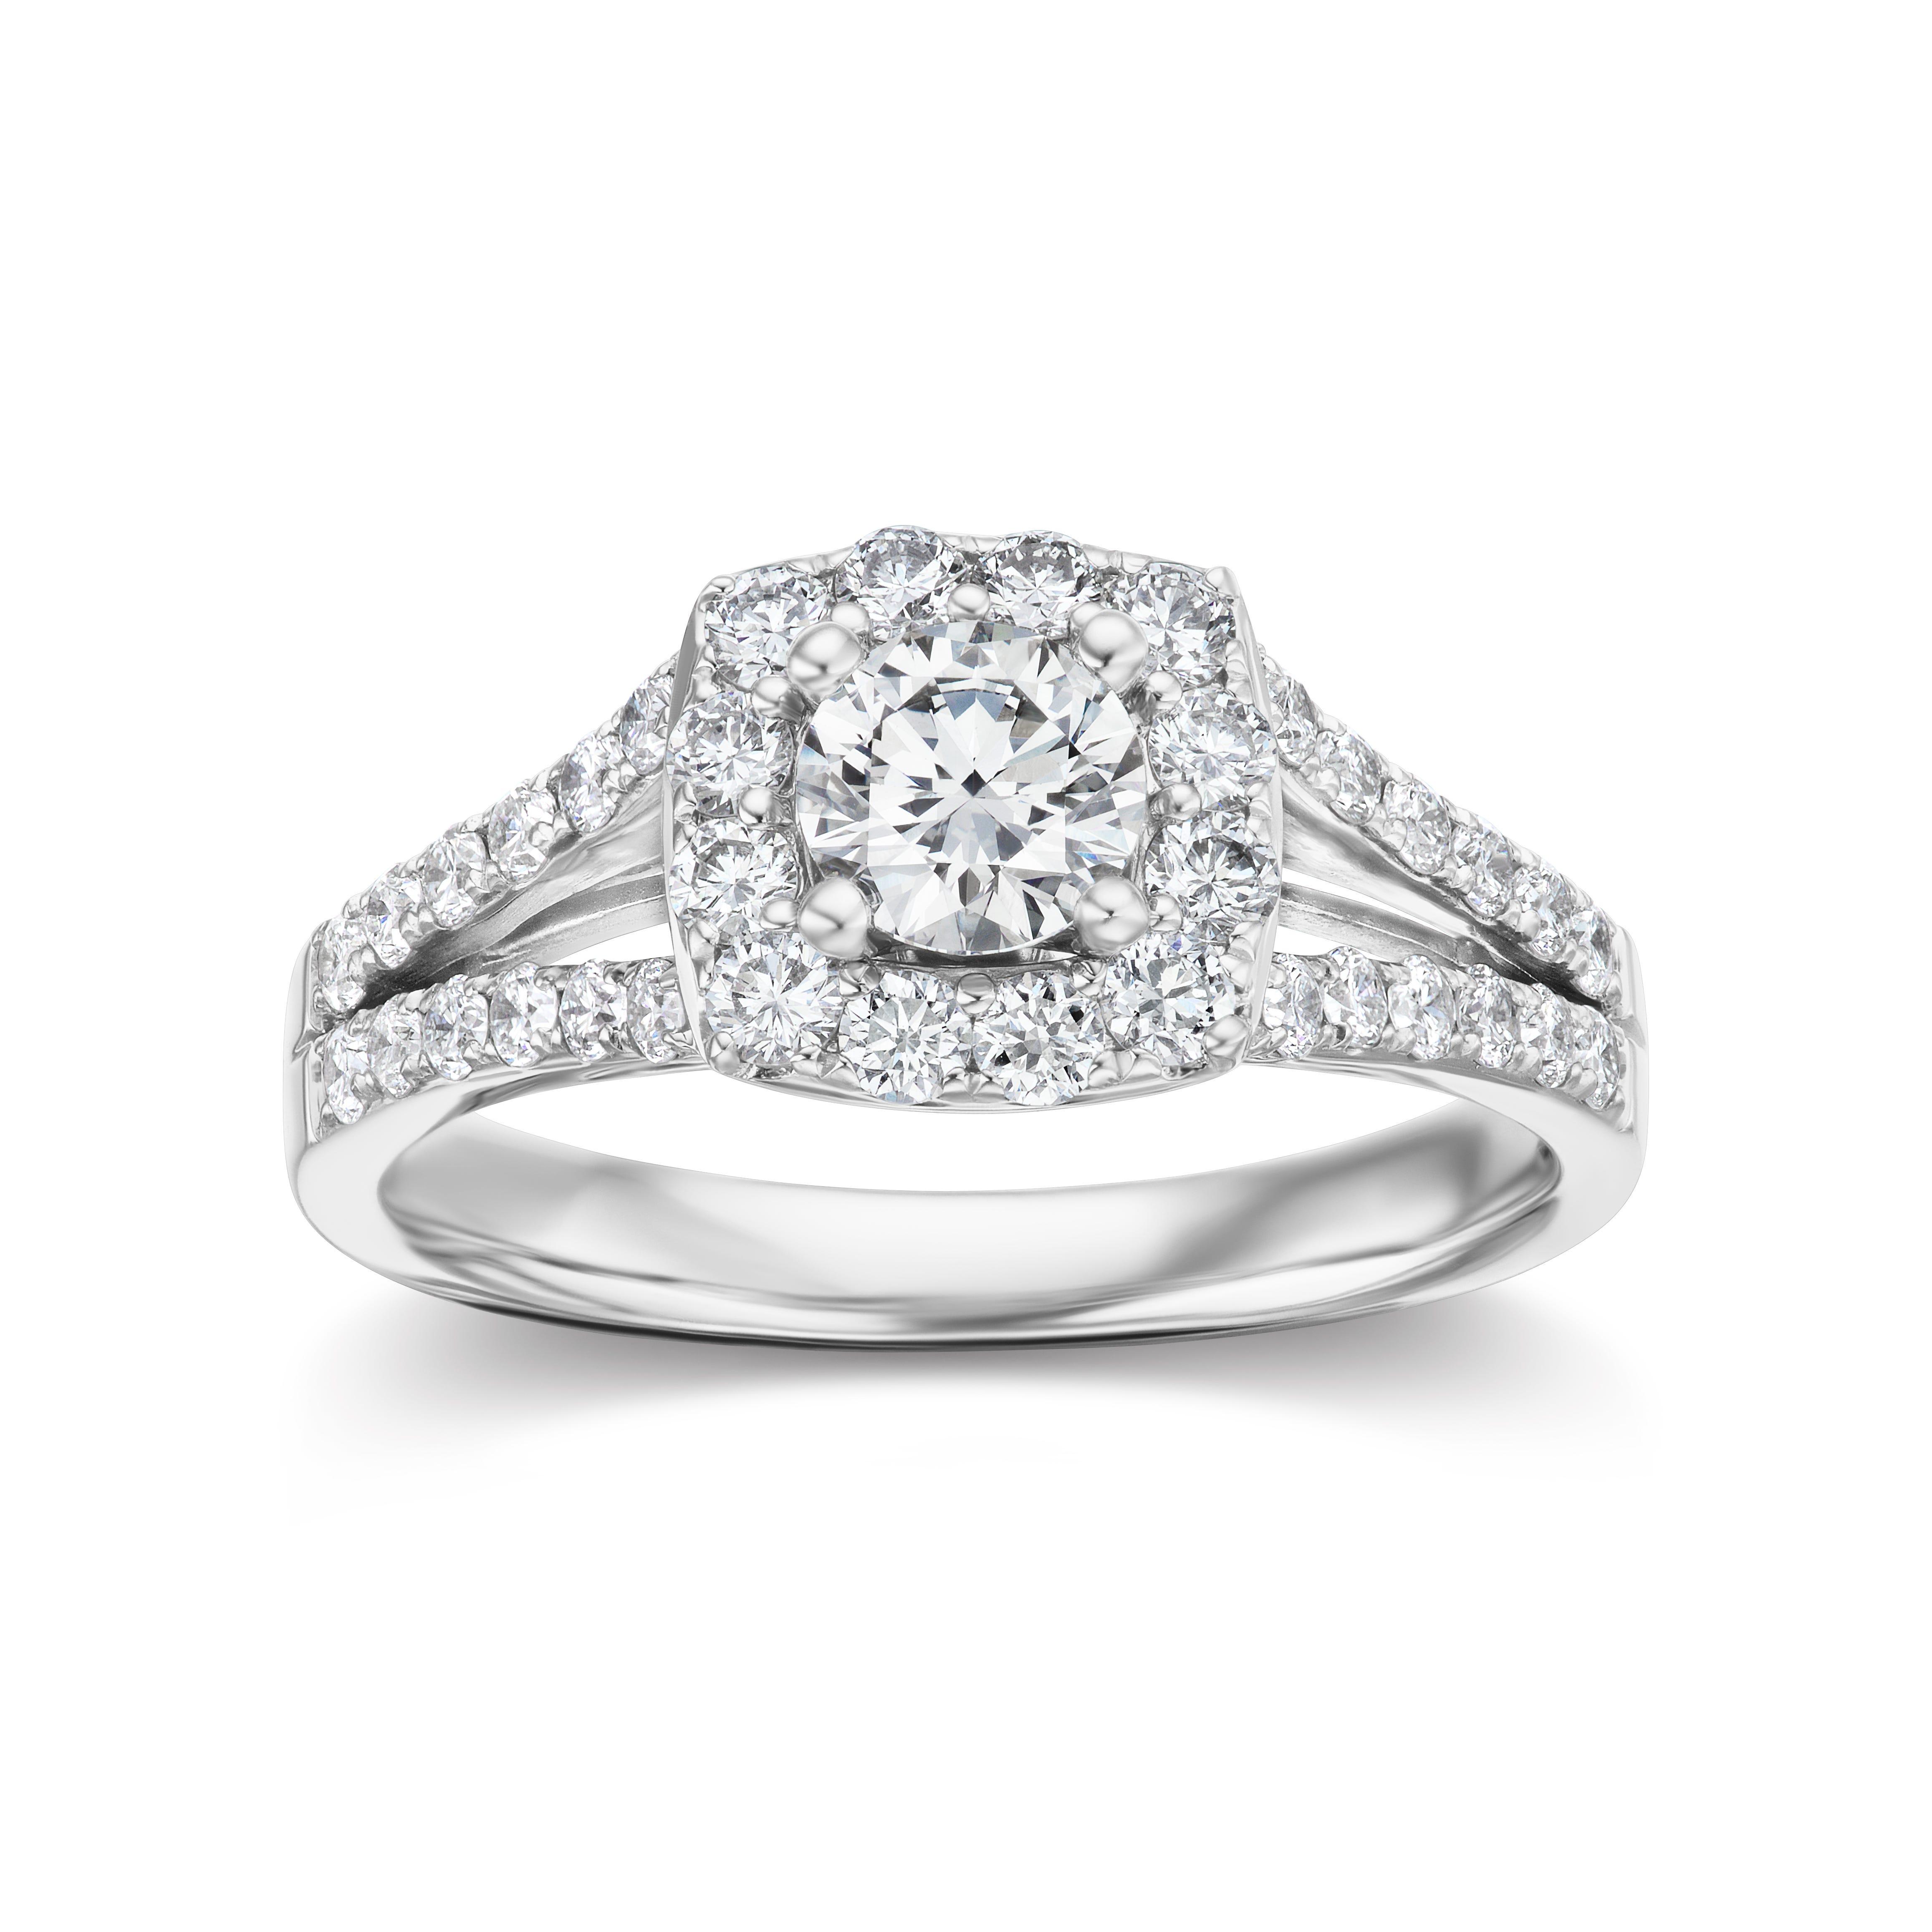 Lab Grown 1 1/4ct. Diamond Split Shank Halo Engagement Ring in 14k White Gold